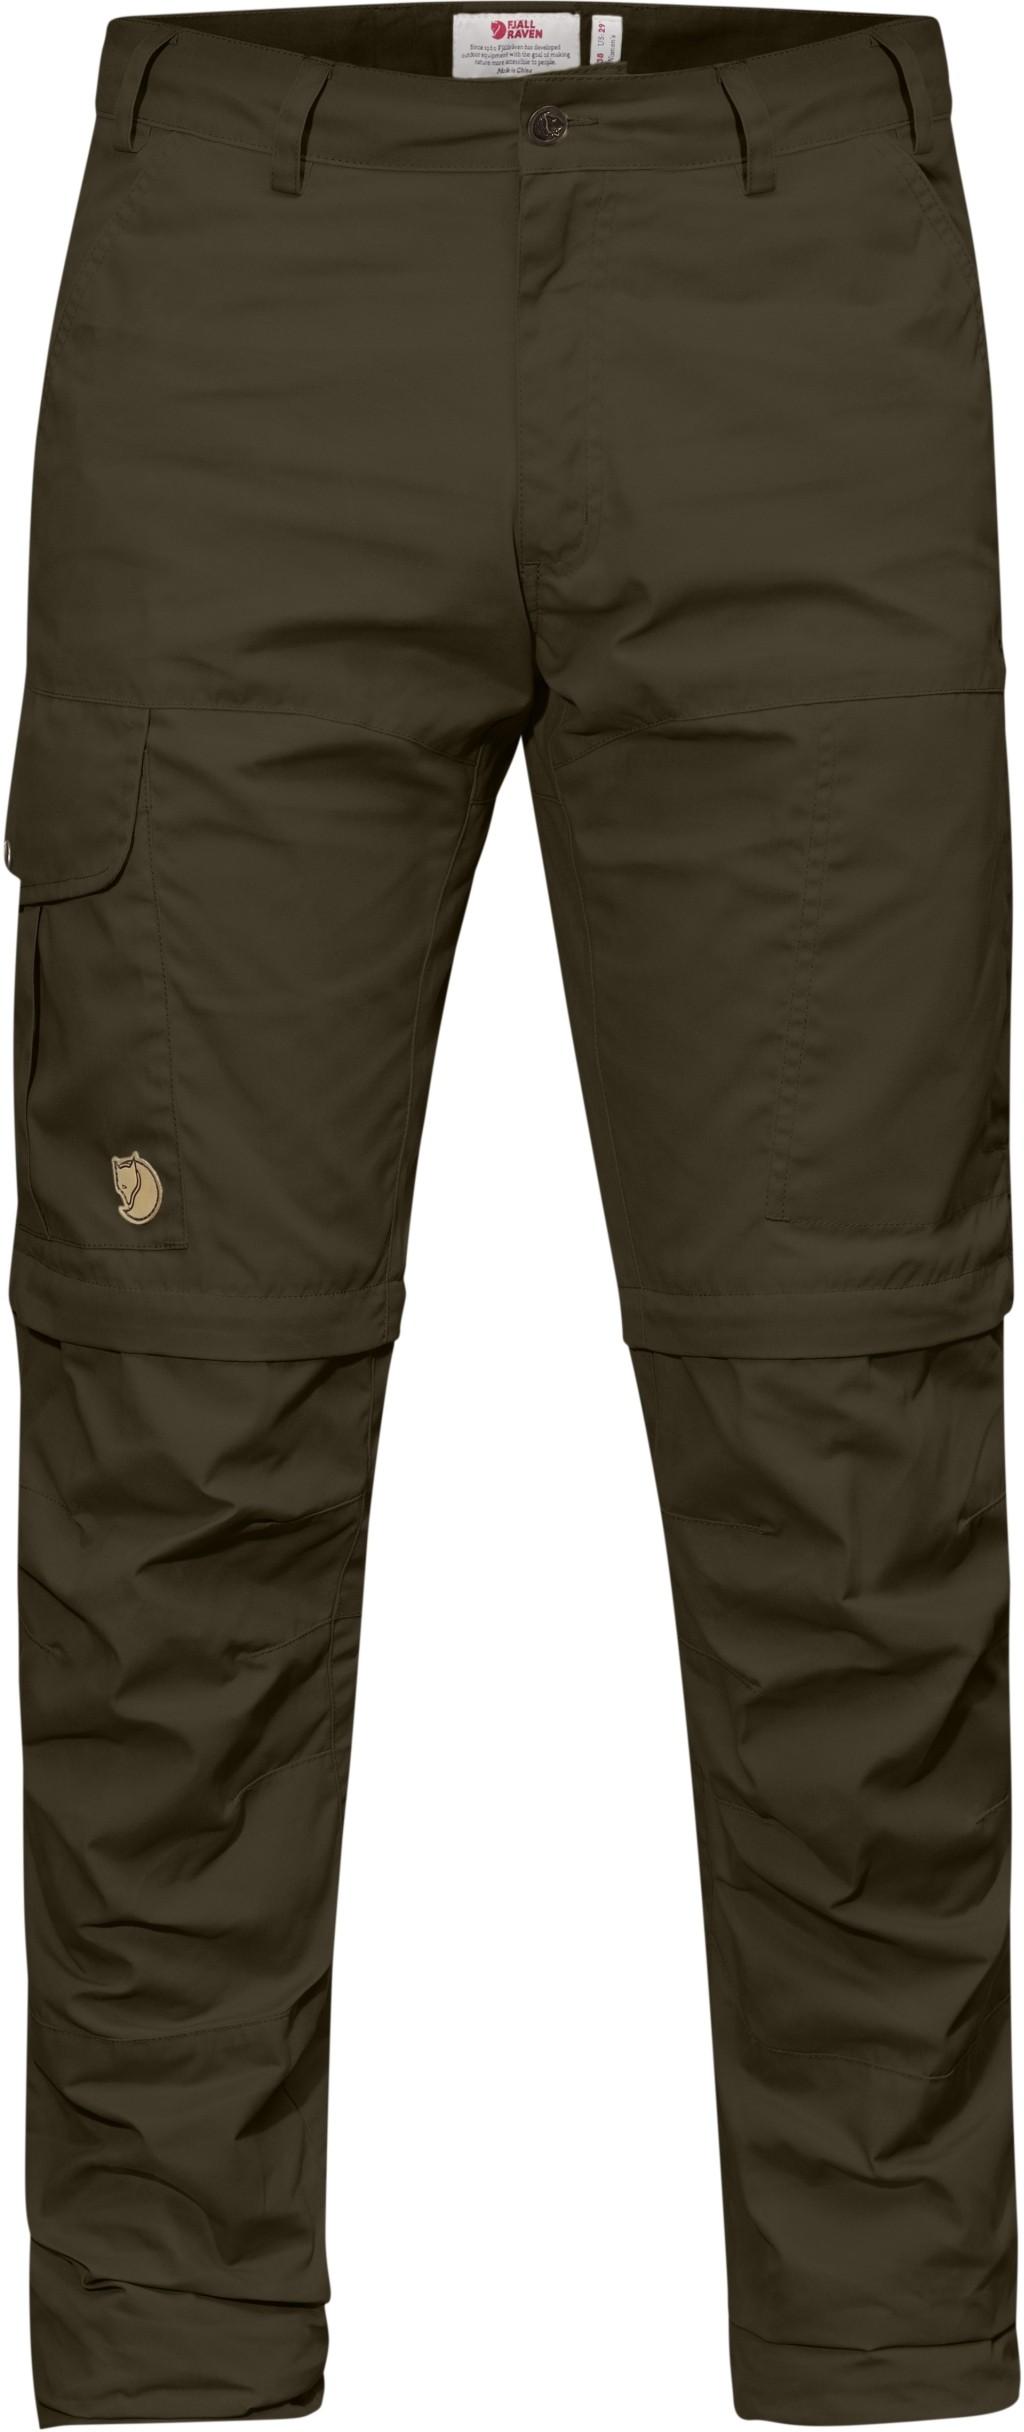 FjallRaven Karl Pro Zip-Off Trousers